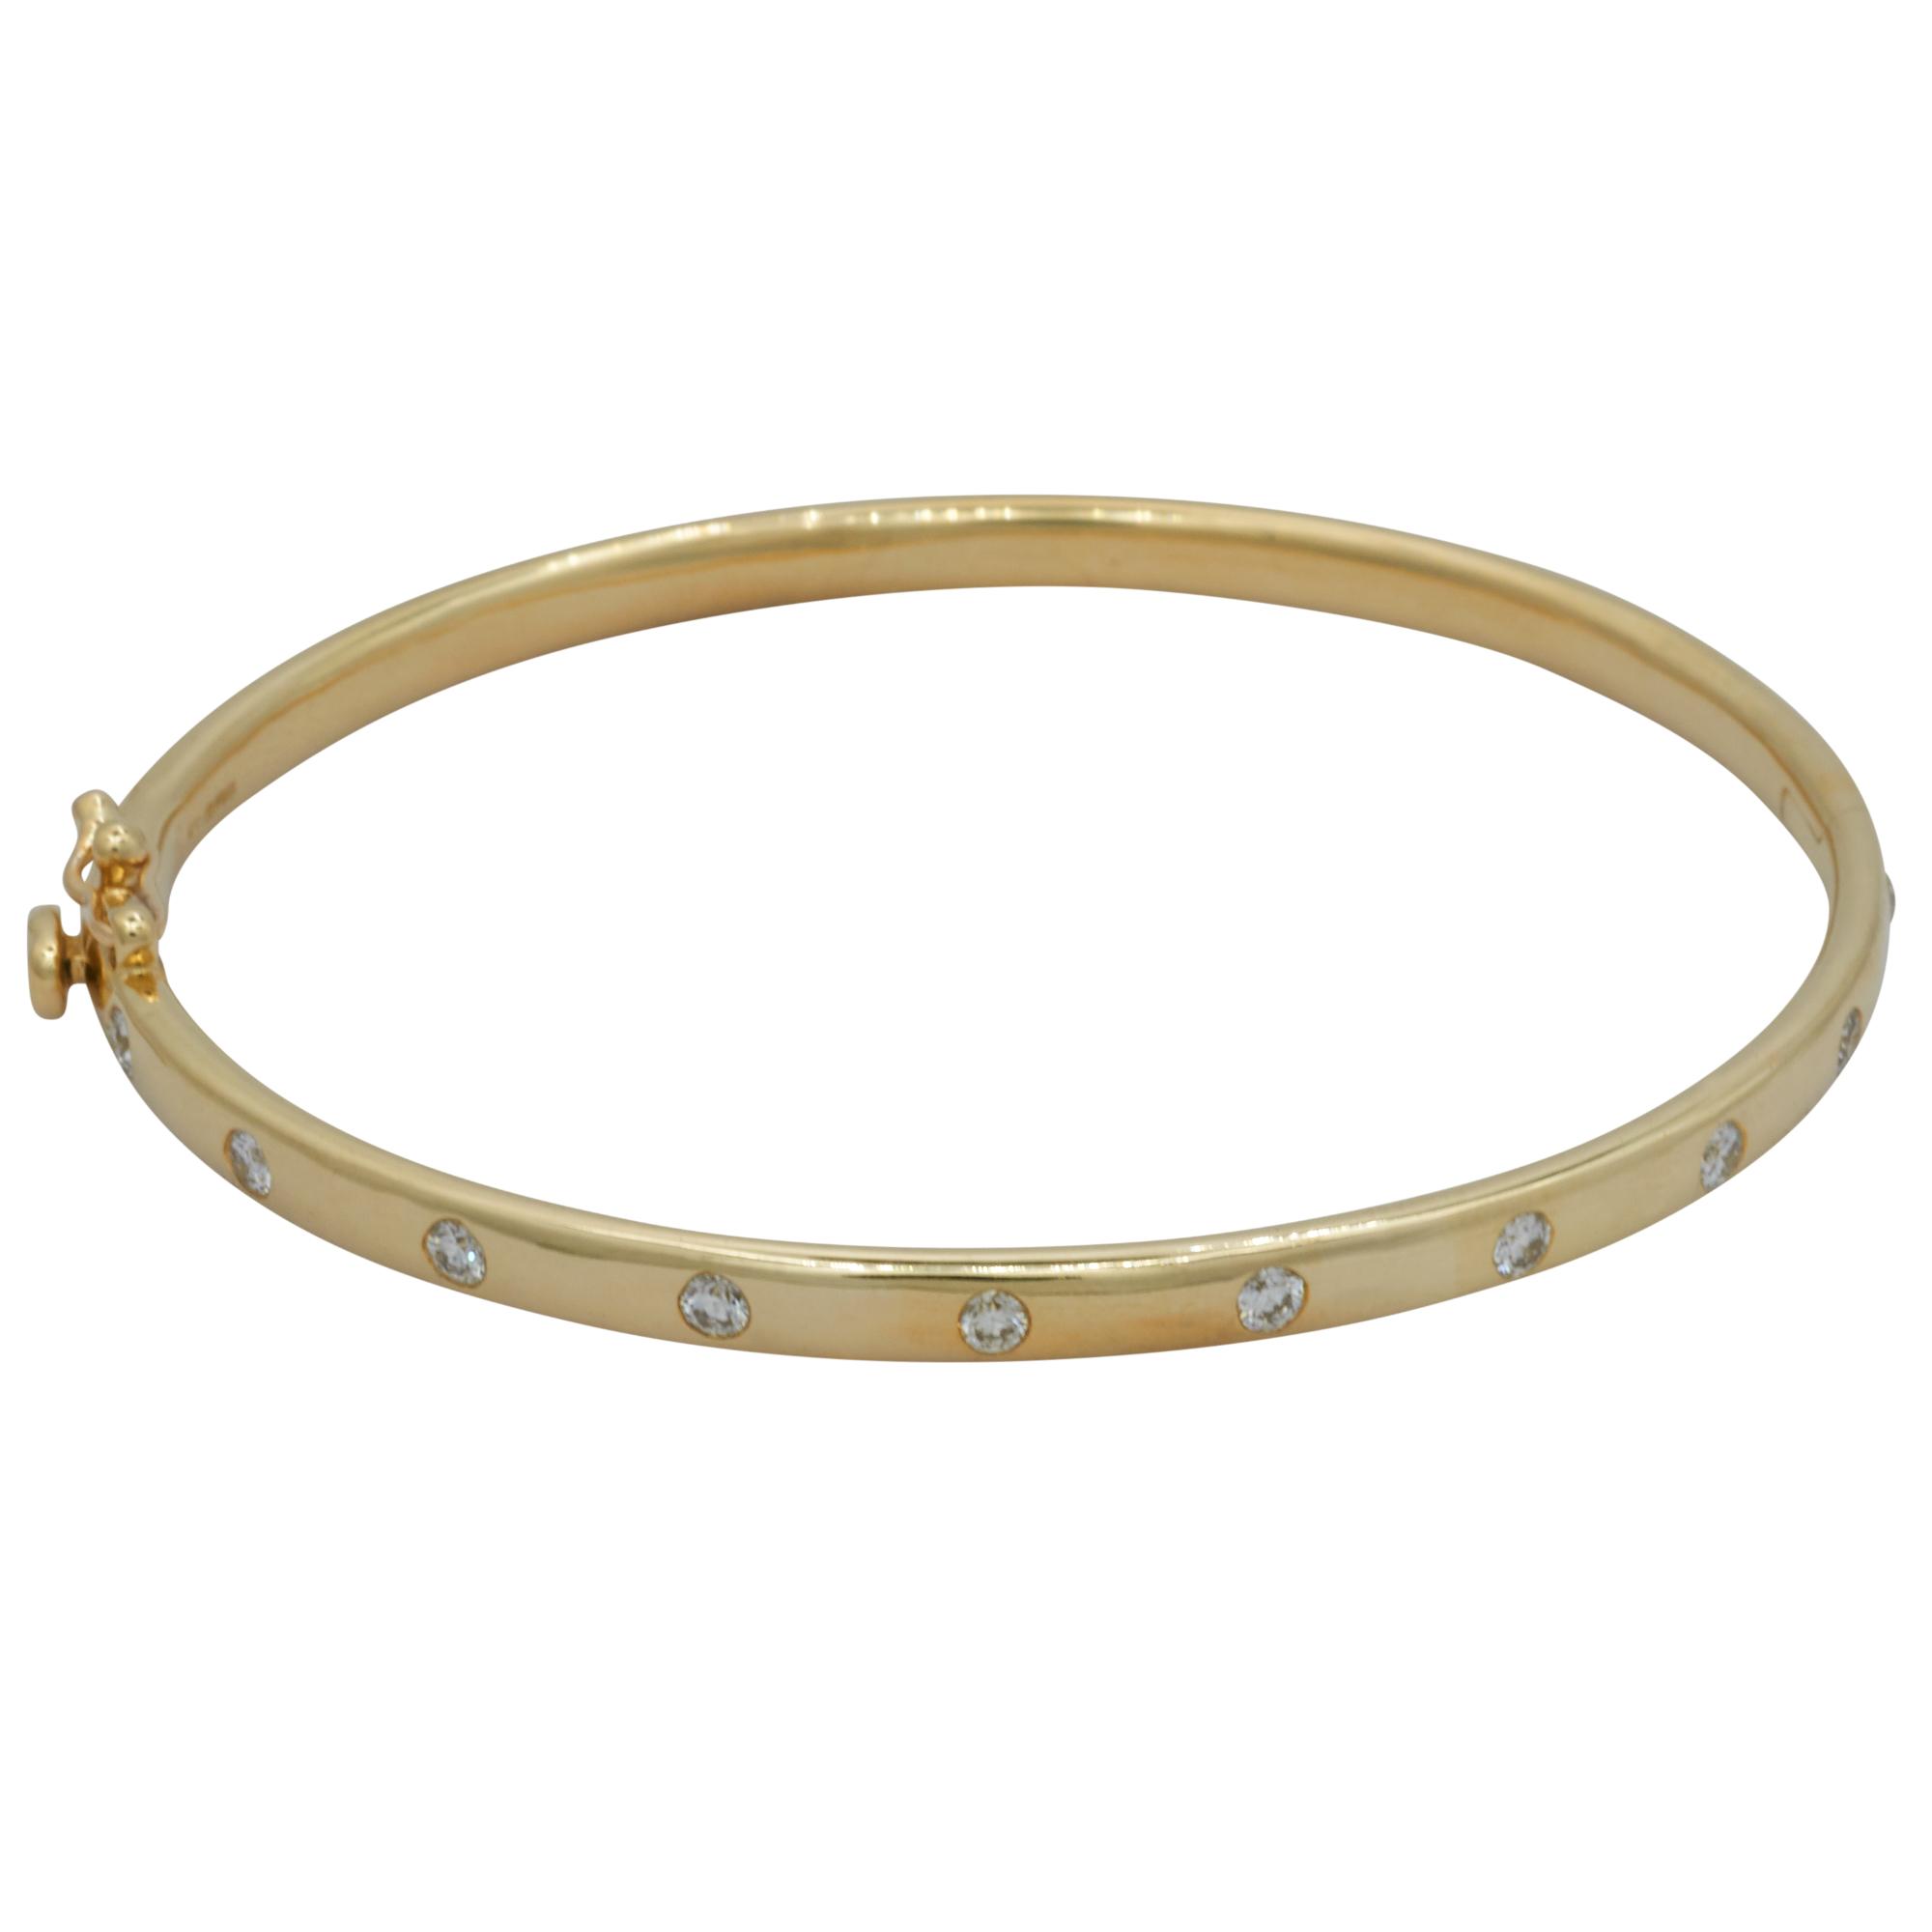 9Ct Yellow Gold Oval Hinge Bangle with Diamonds